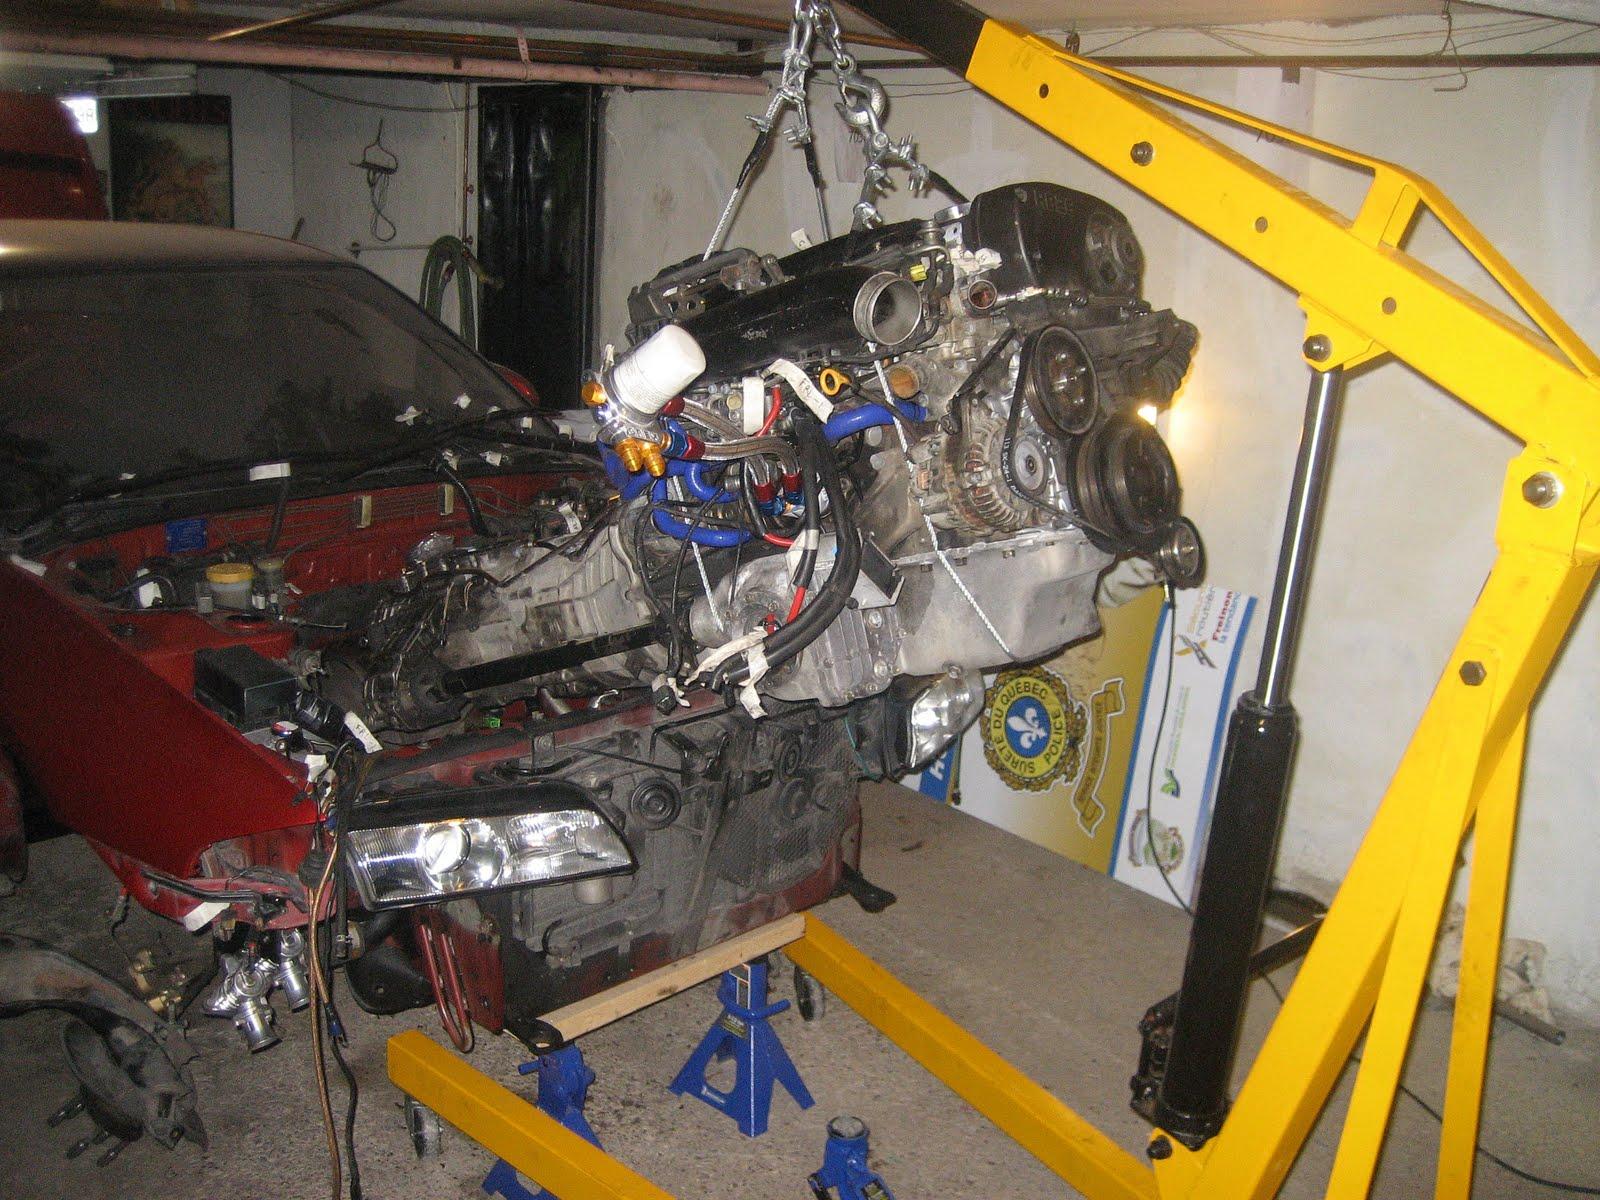 rb26 engine installation nissan skyline rh skylife4ever com RB26 vs 2JZ-GTE Nissan Skyline R38